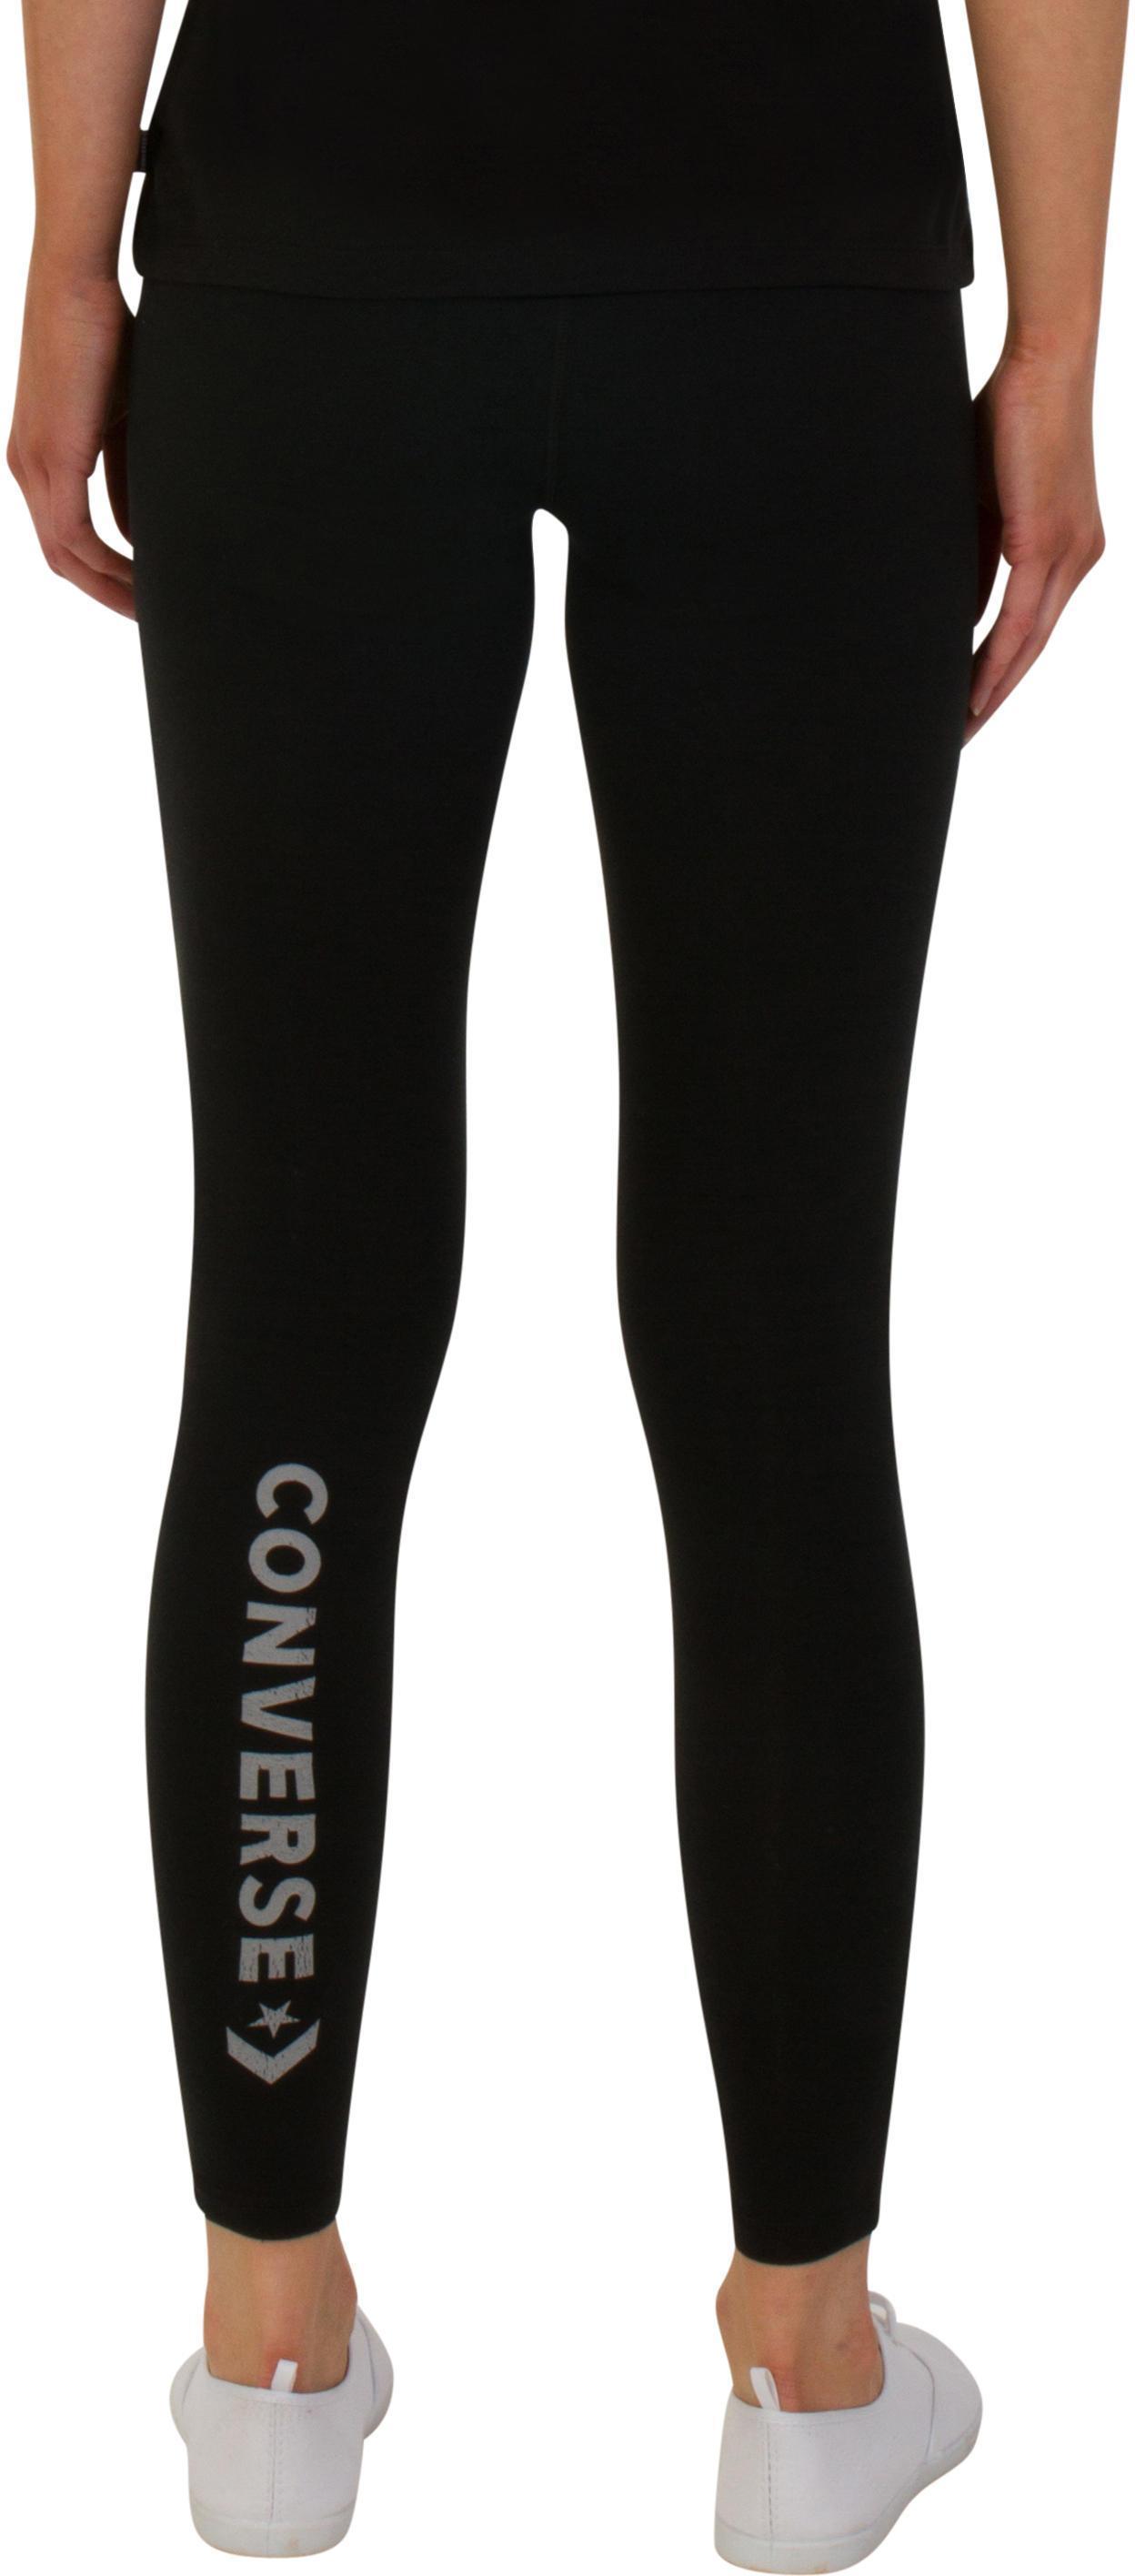 a09cf50fefc4 Converse - Black Core Reflective Wordmark Leggings - Lyst. View fullscreen